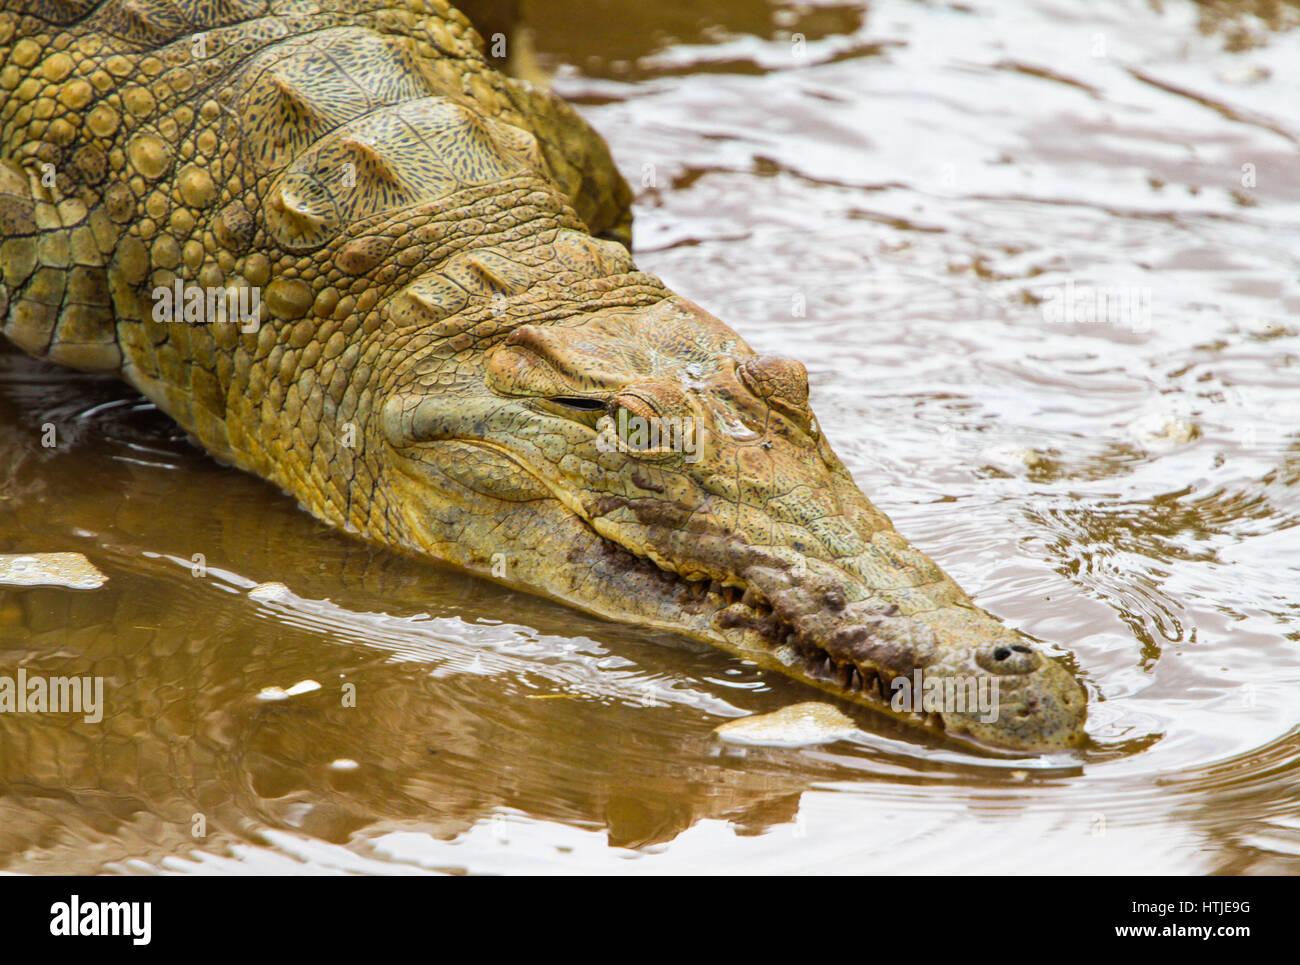 Crocodile in Tsavo East National Park. Kenya. Stock Photo